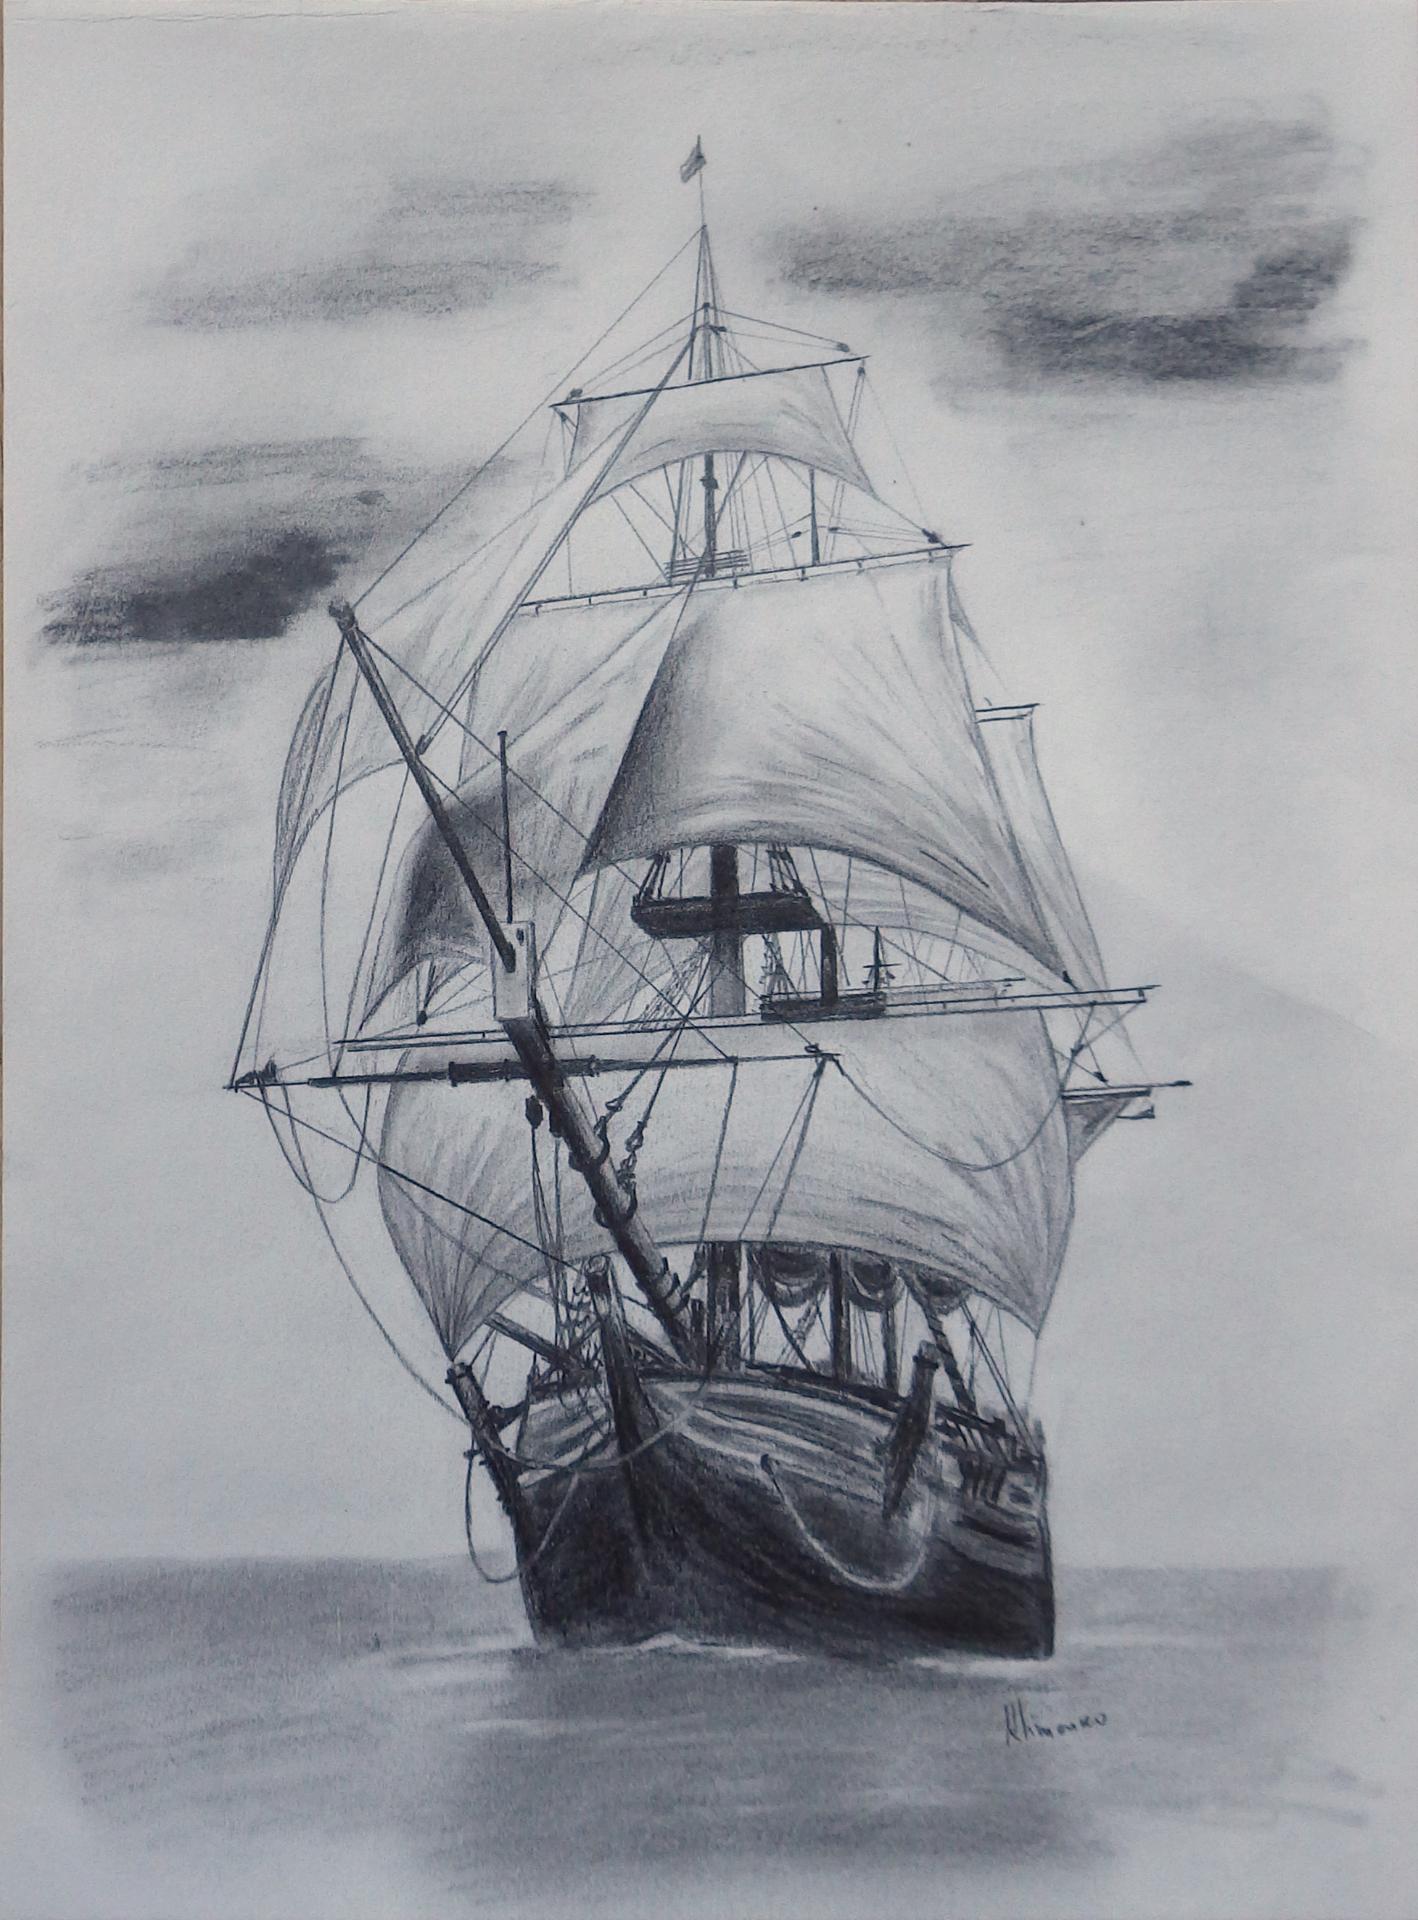 Old tall ship, sail ship sketch. Original art, graphite pencil ...